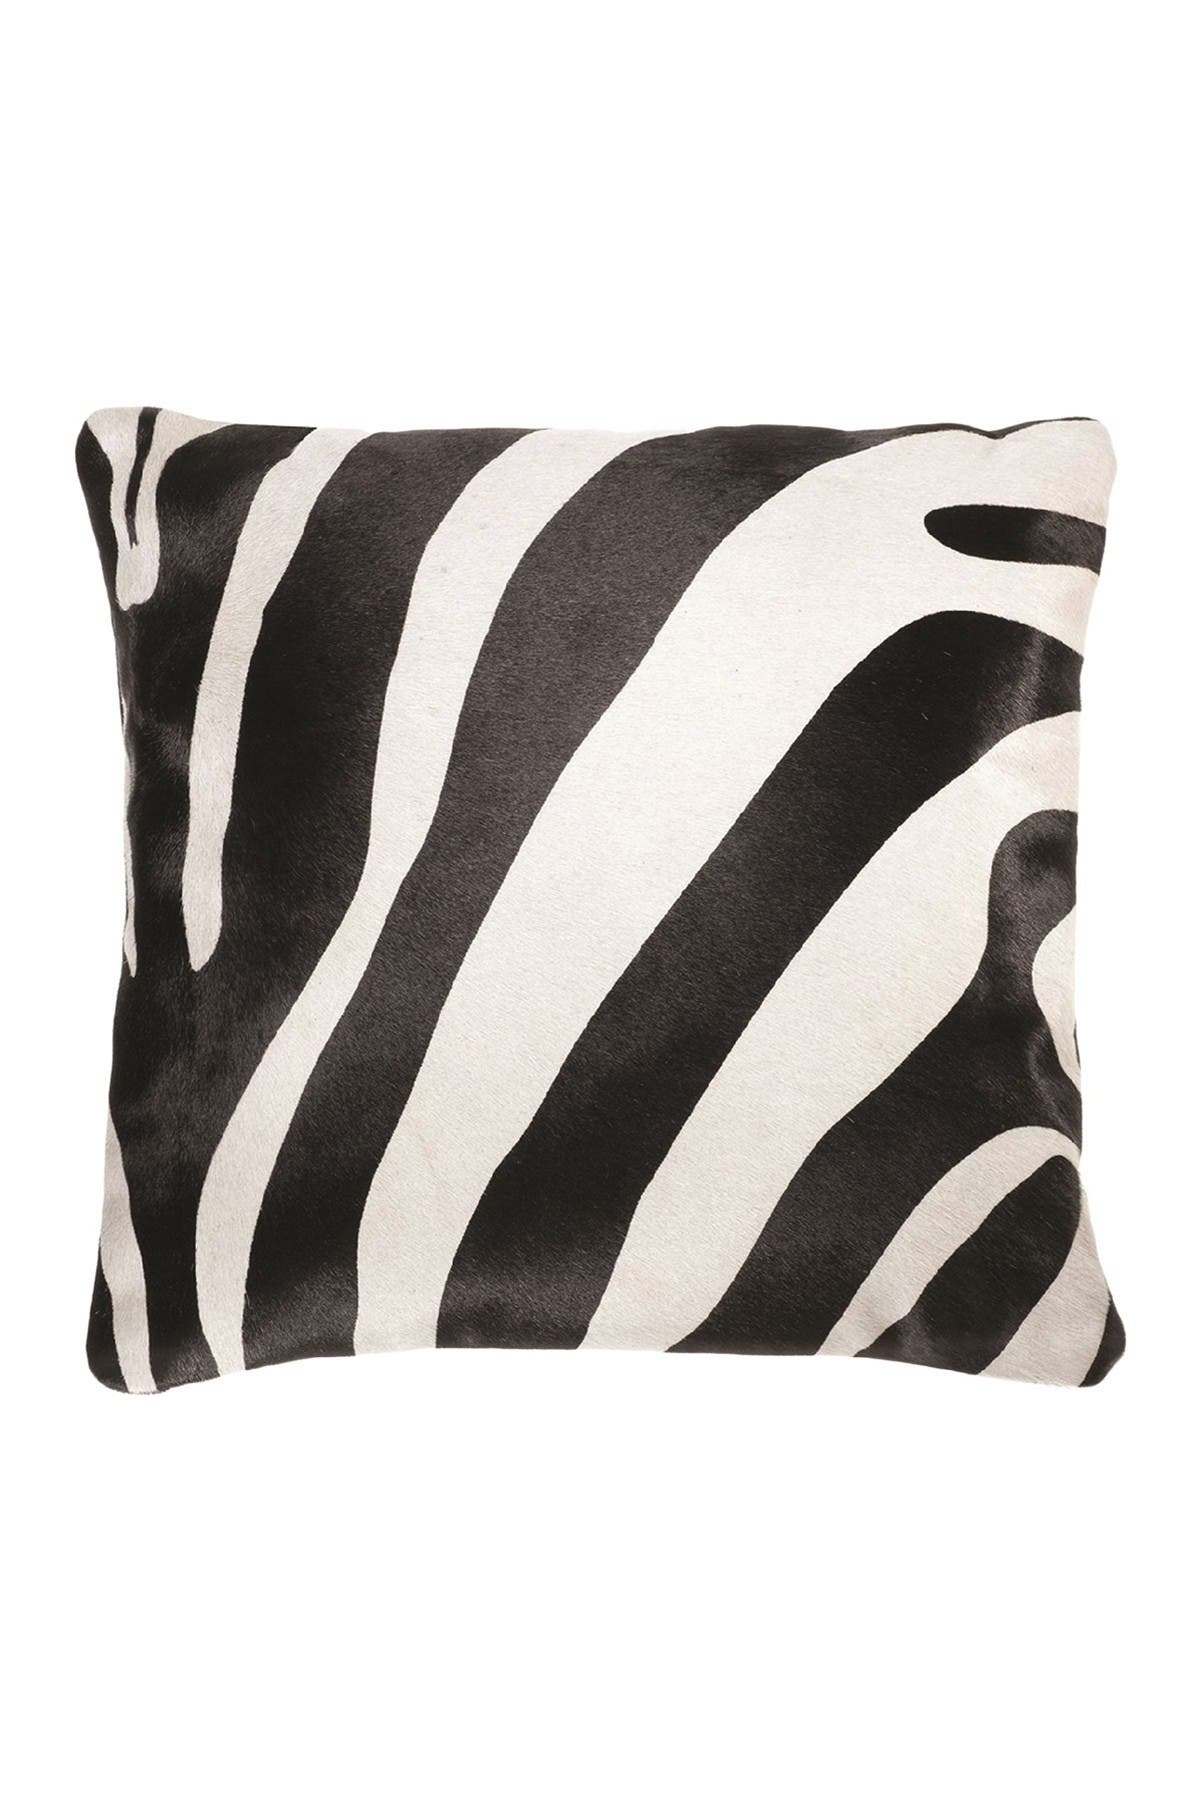 "Image of Natural Torino Genuine Cowhide Pillow - 18""x18"" - Zebra"